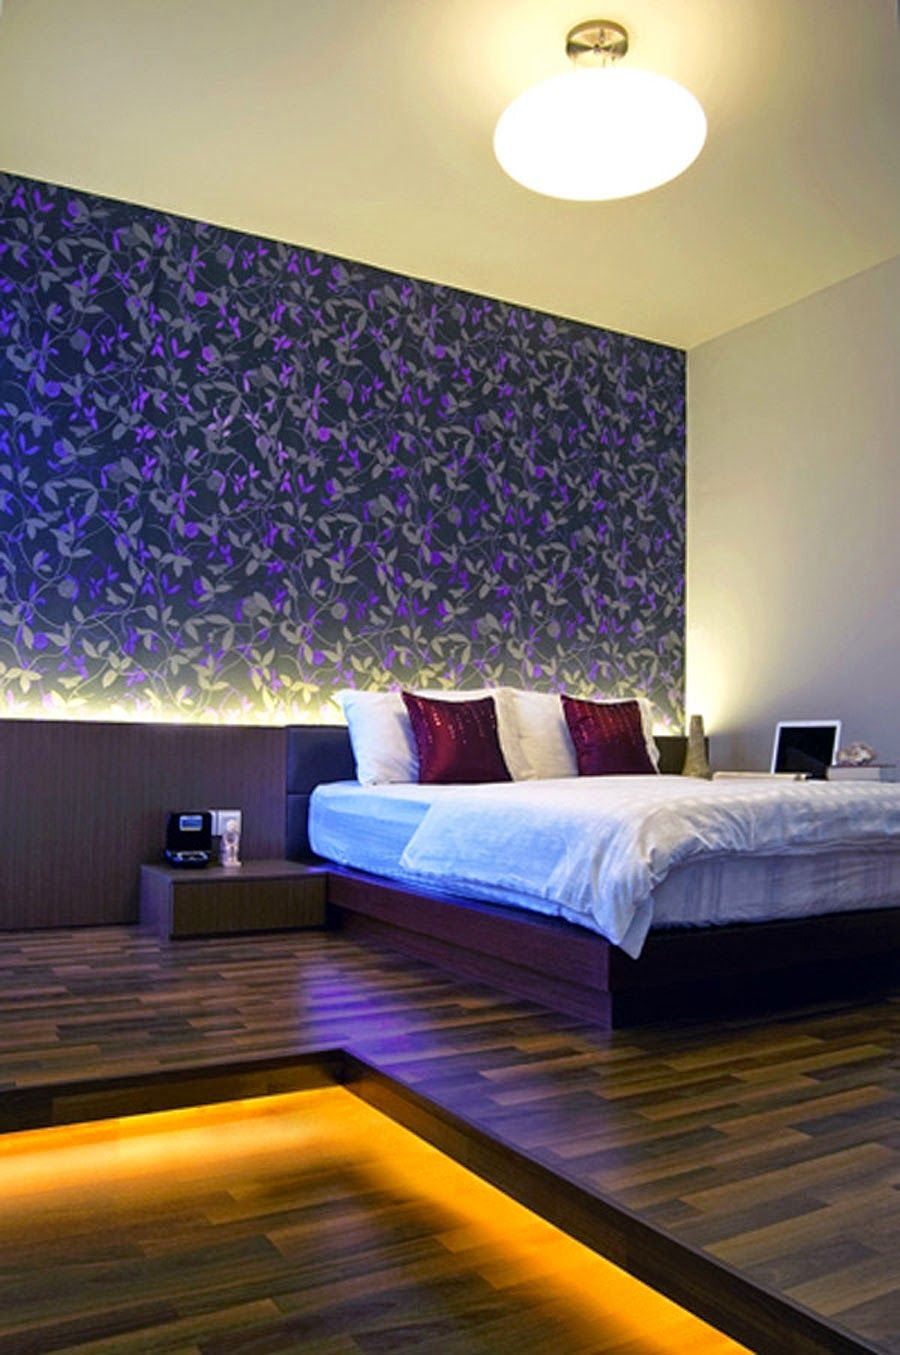 Bedroom Lighting Ideas Small Bedroom Lighting Ideas Interior Design Bedroom Bedroom Wall Colors Bedroom Design